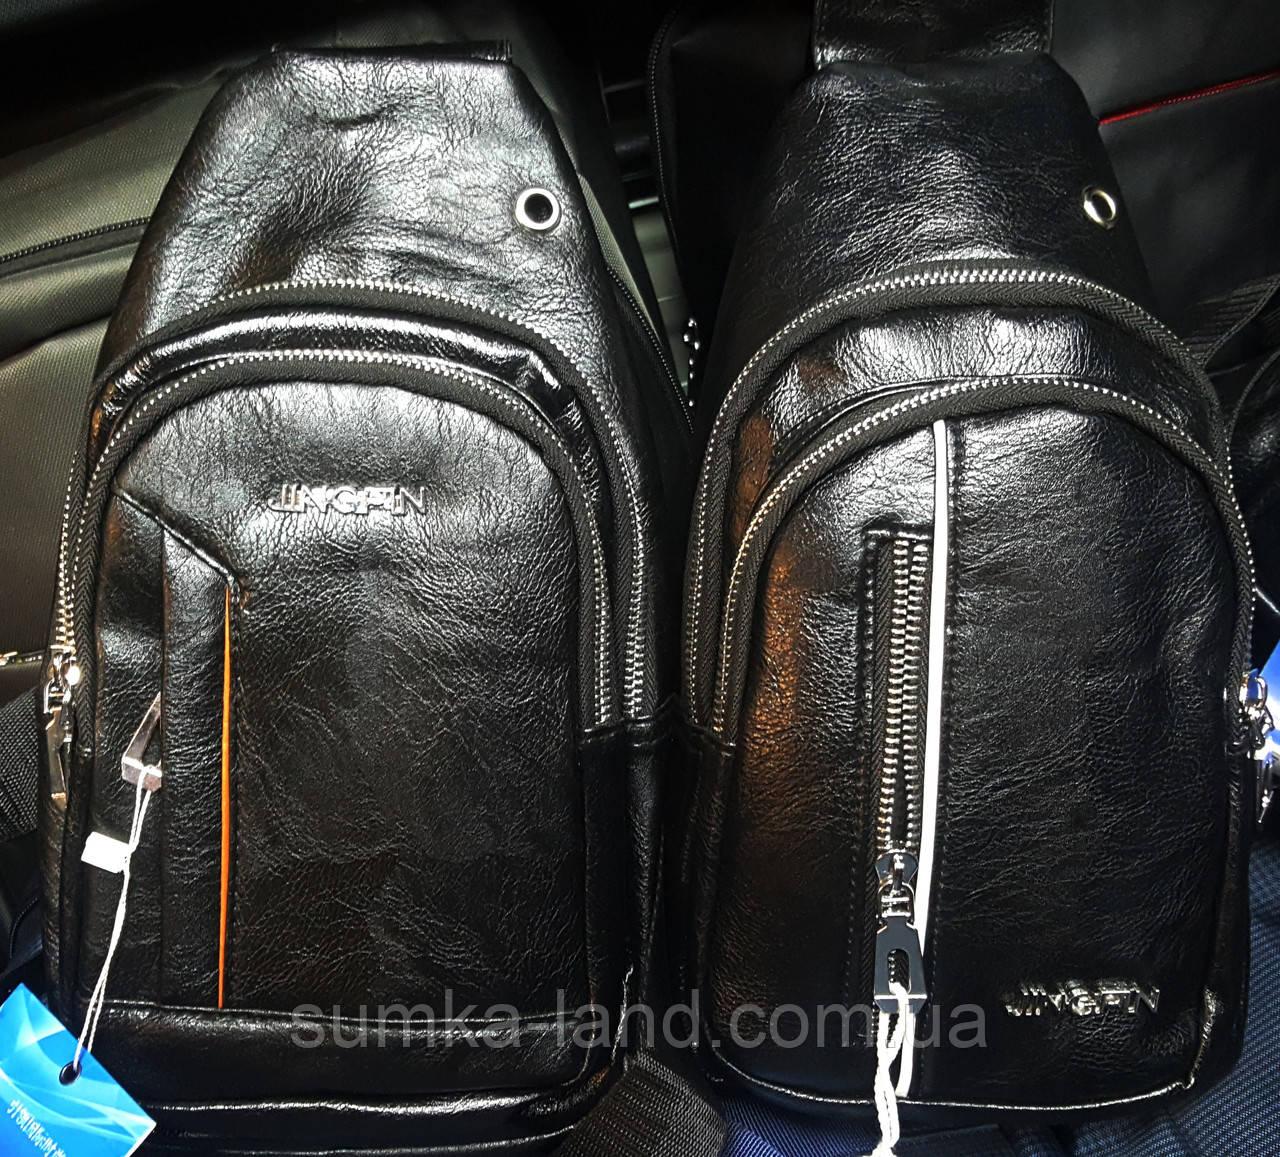 168330797bb2 Мужские барсетки из кожзама на 2 основных отделения два вида ...